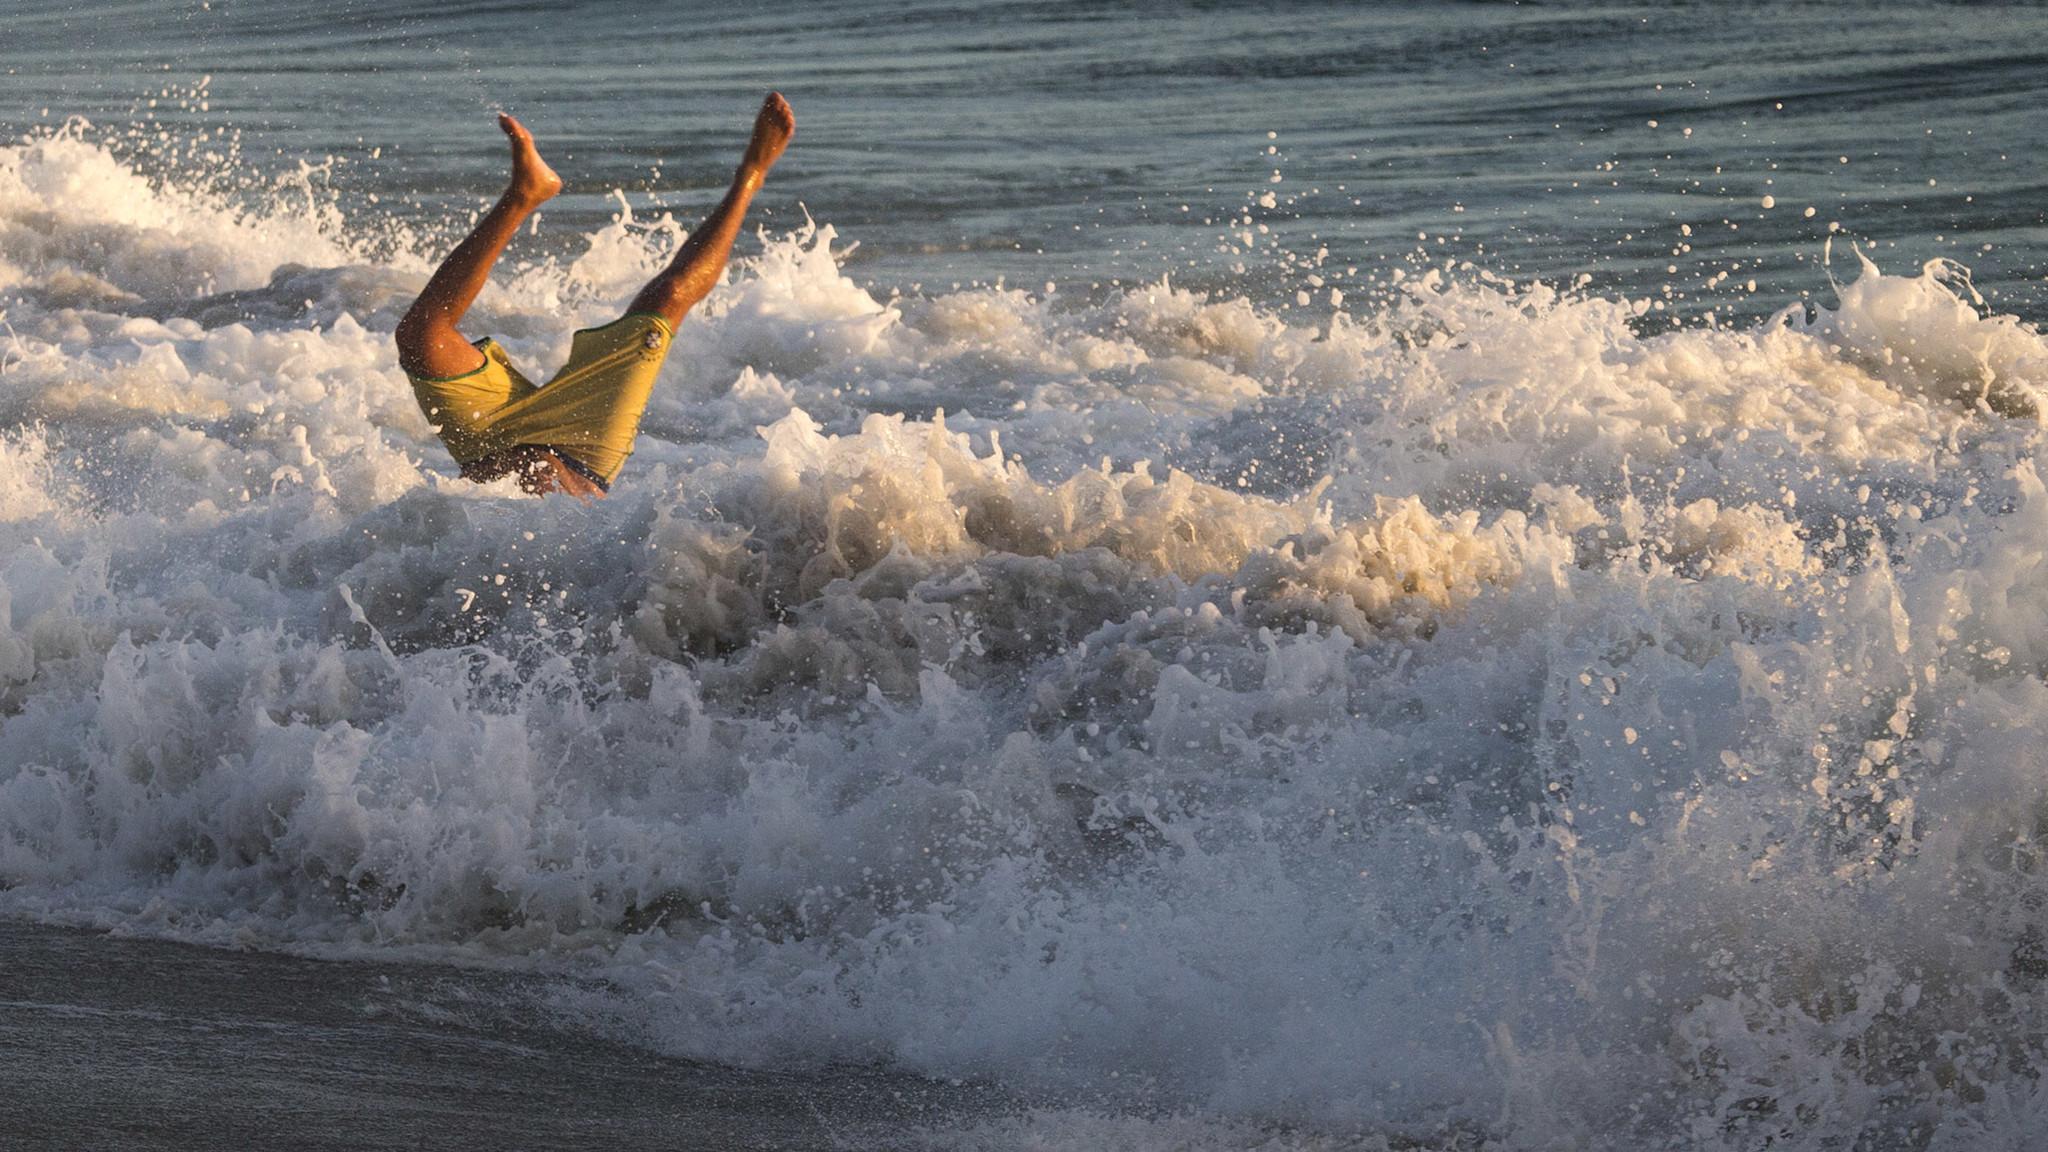 A body surfer is upended in the crashing surf at Windansea Beach in La Jolla. (Allen J. Schaben / Los Angeles Times)